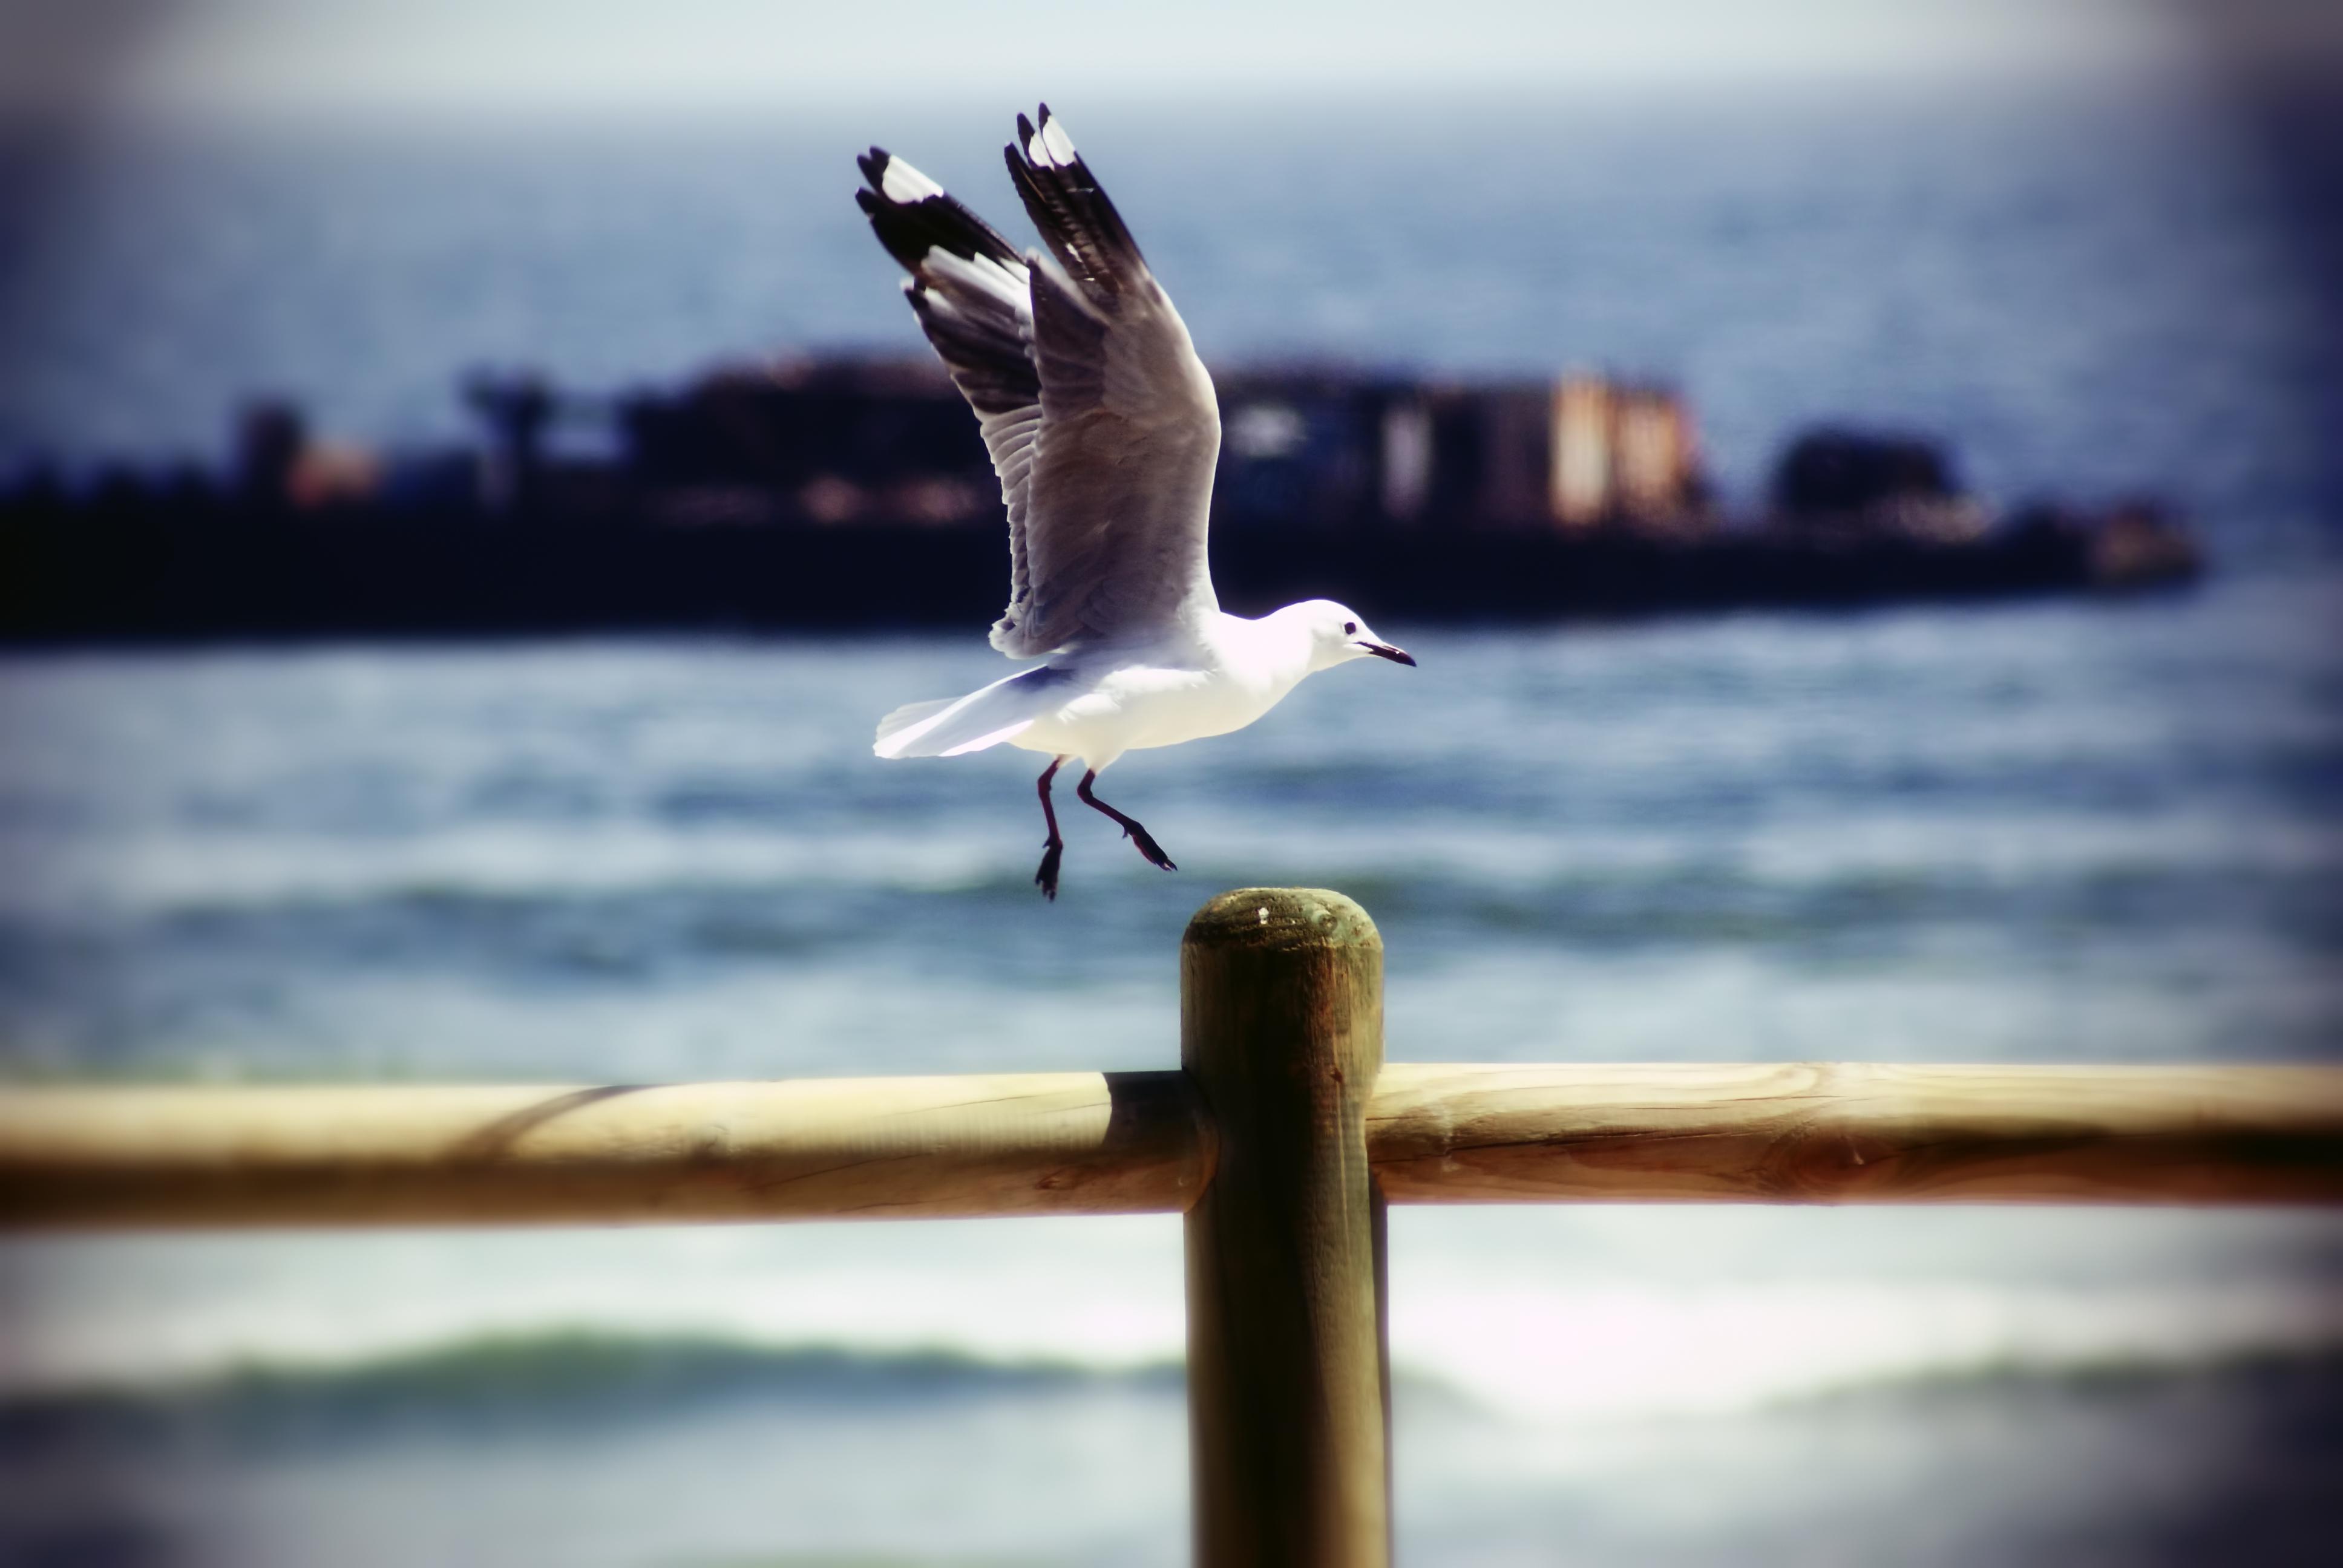 The seagull photo